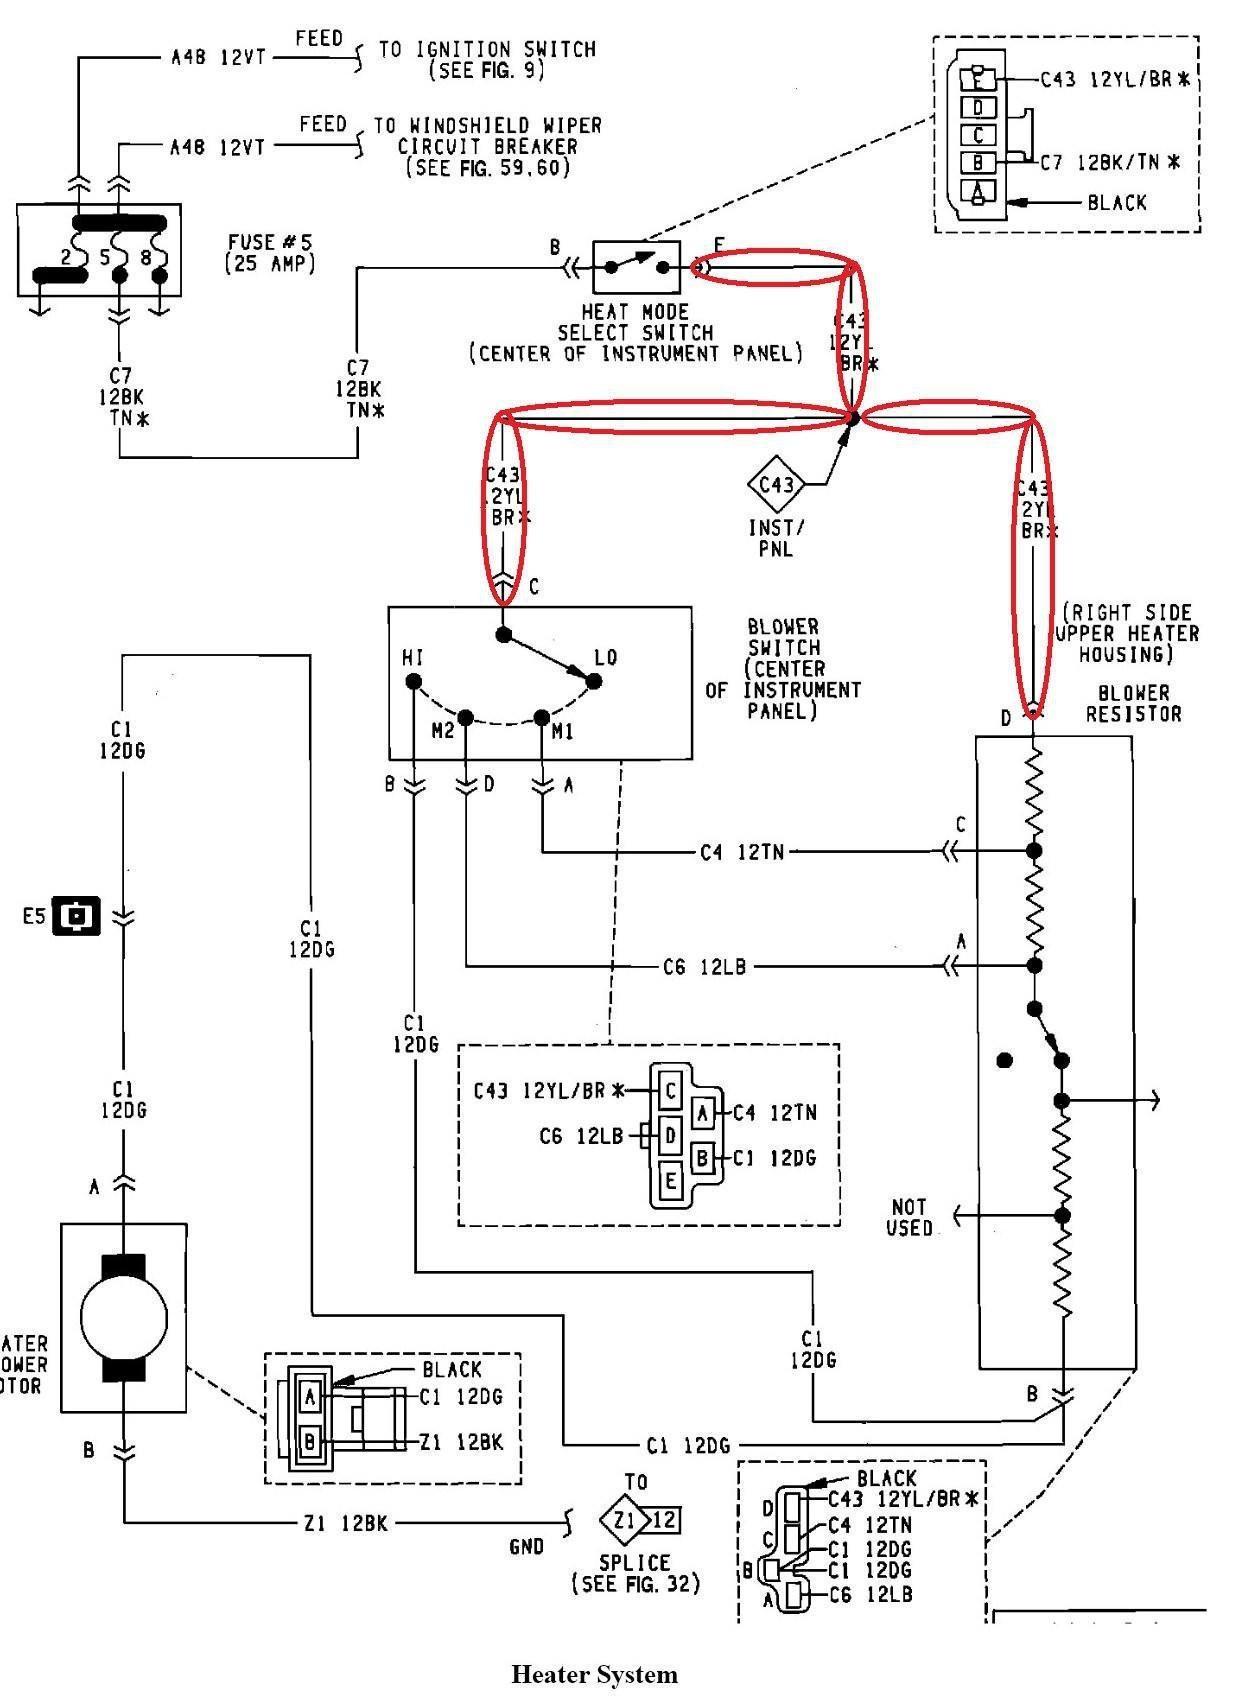 DD_8217 Ez Go Golf Cart 36 Volt Battery Charger Wiring Diagram Free Diagram [ 1700 x 1256 Pixel ]